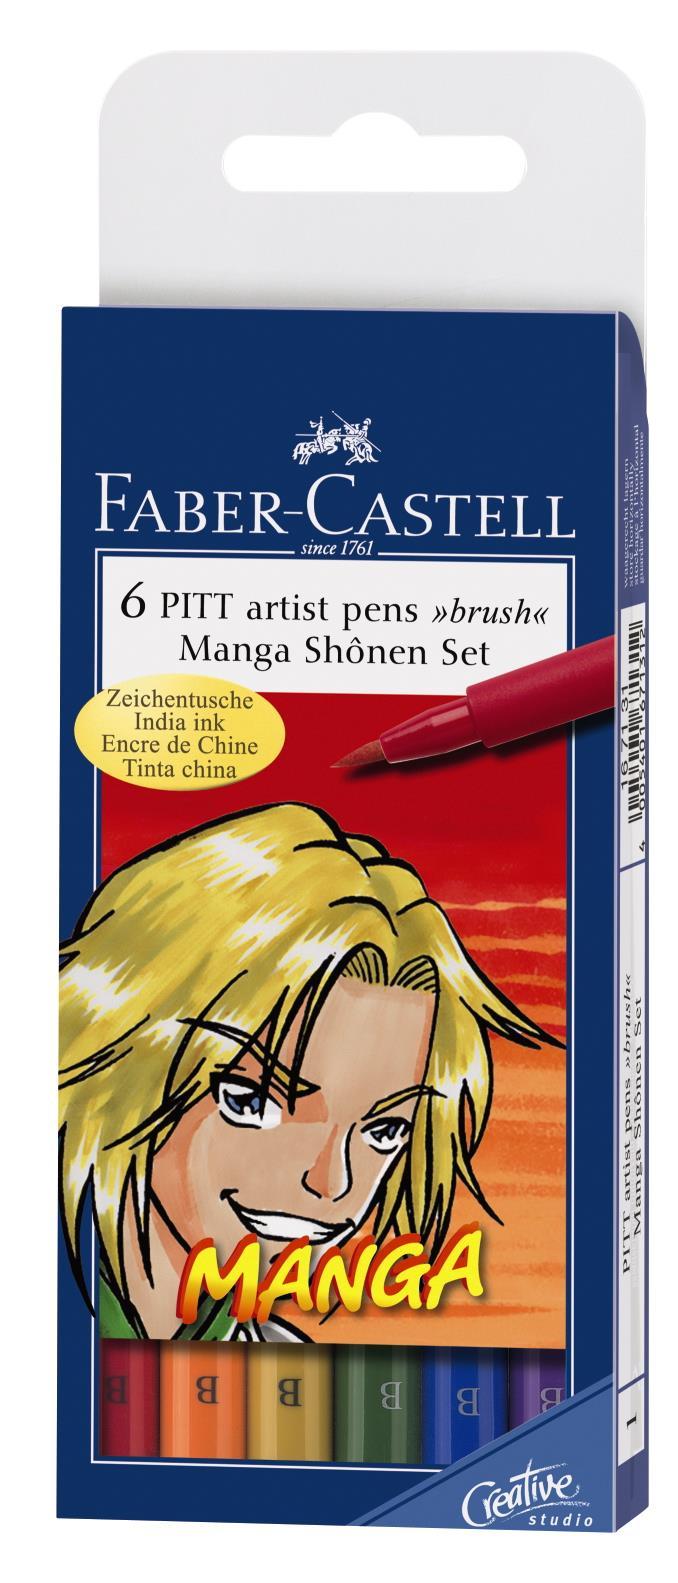 Pitt Artist Pen Manga Set Shonen Faber-castell